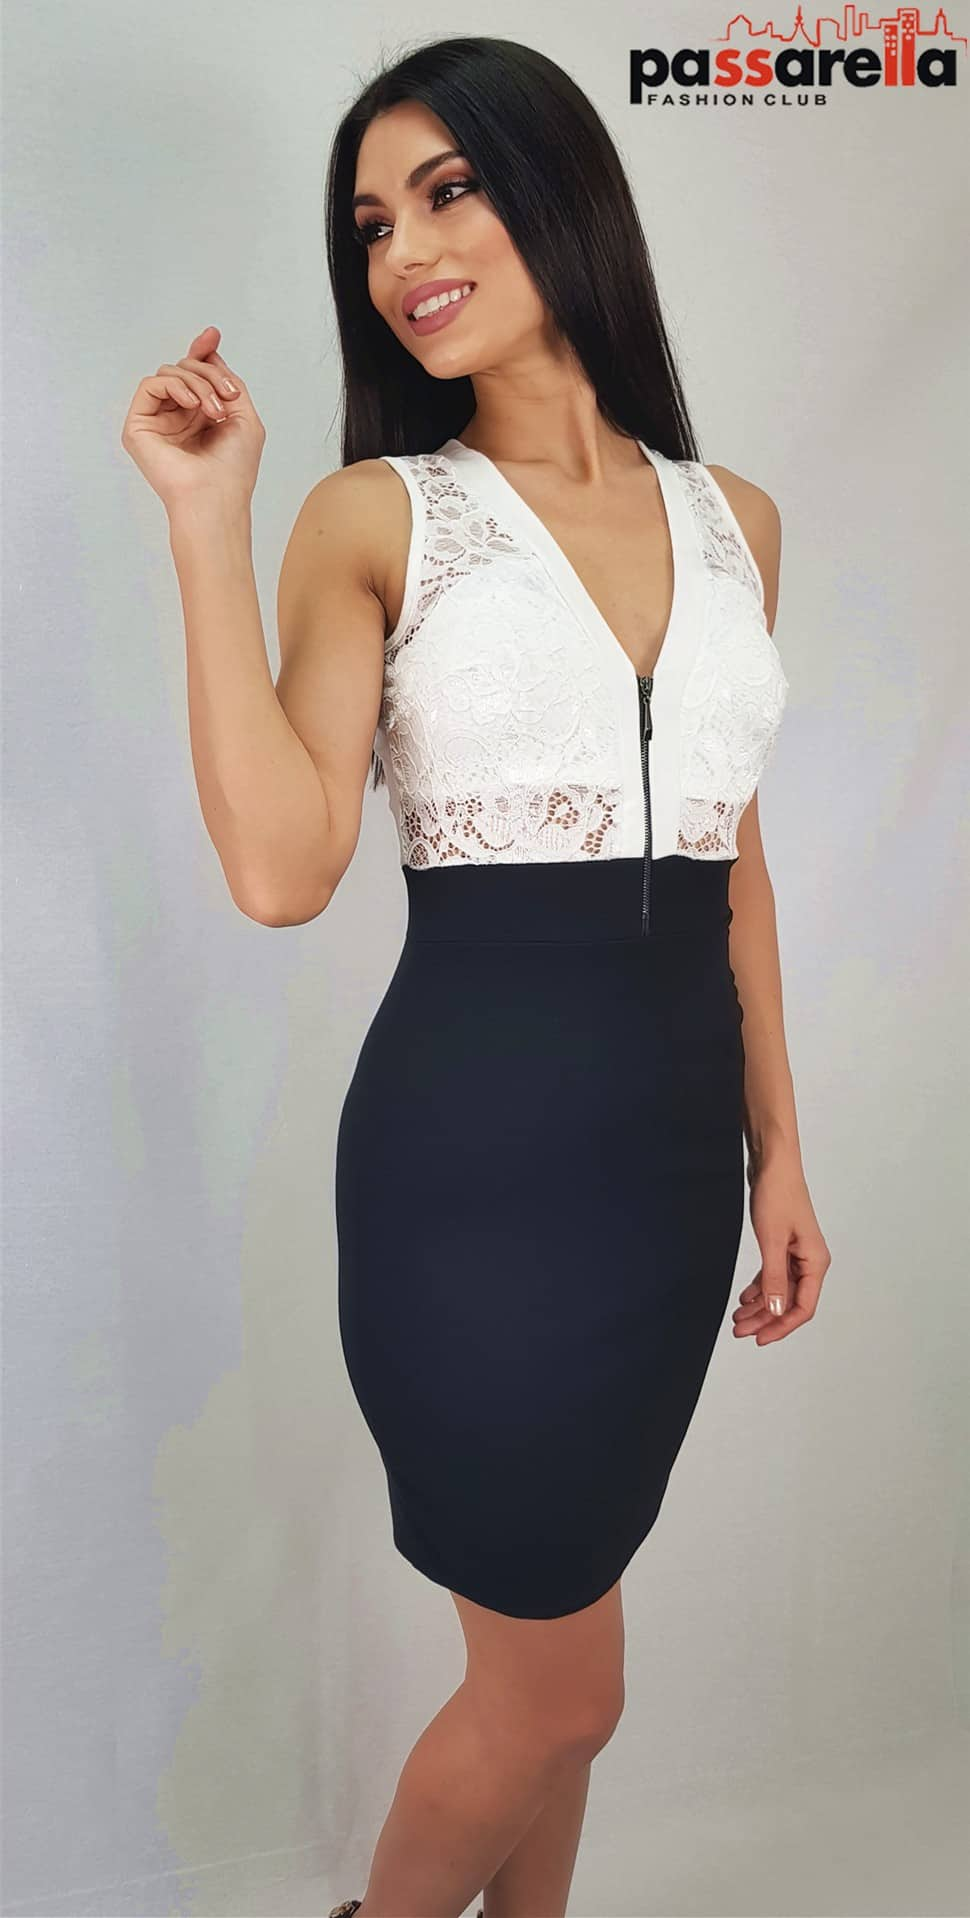 cb3951ae46a7 Φόρεμα ΜίνιDB004 - Passarella fashion club - eshop